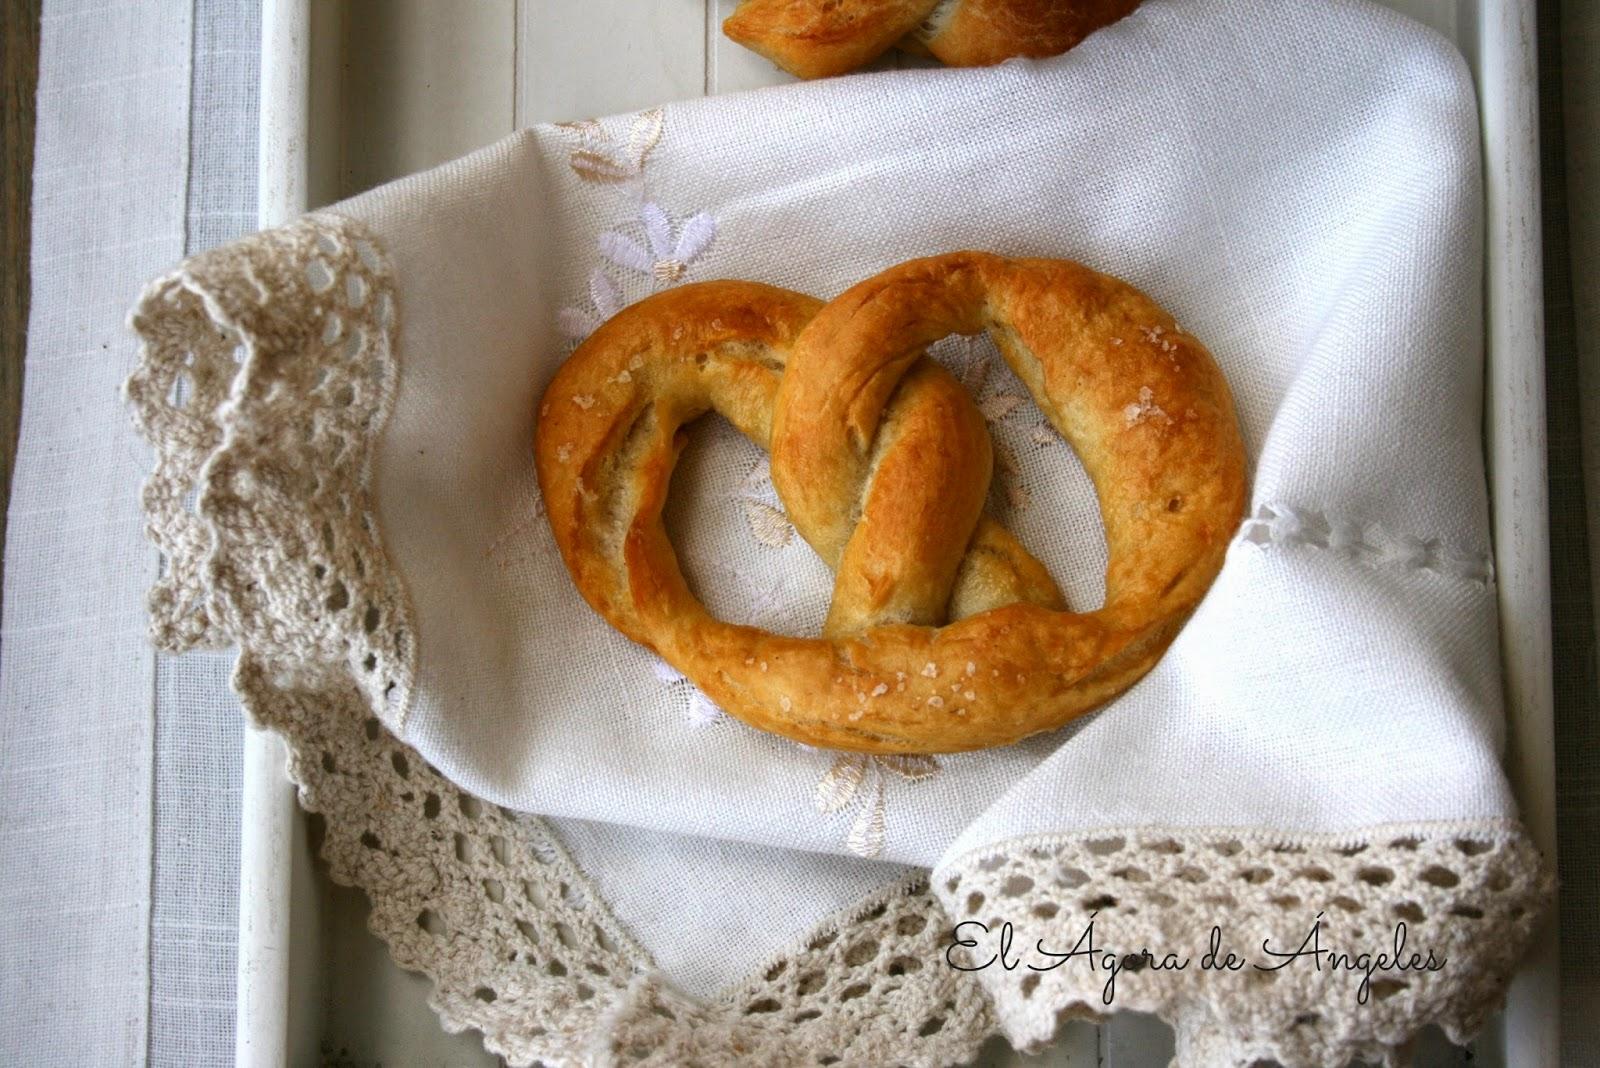 Cómo hacer pretzels-bretzels paso a paso